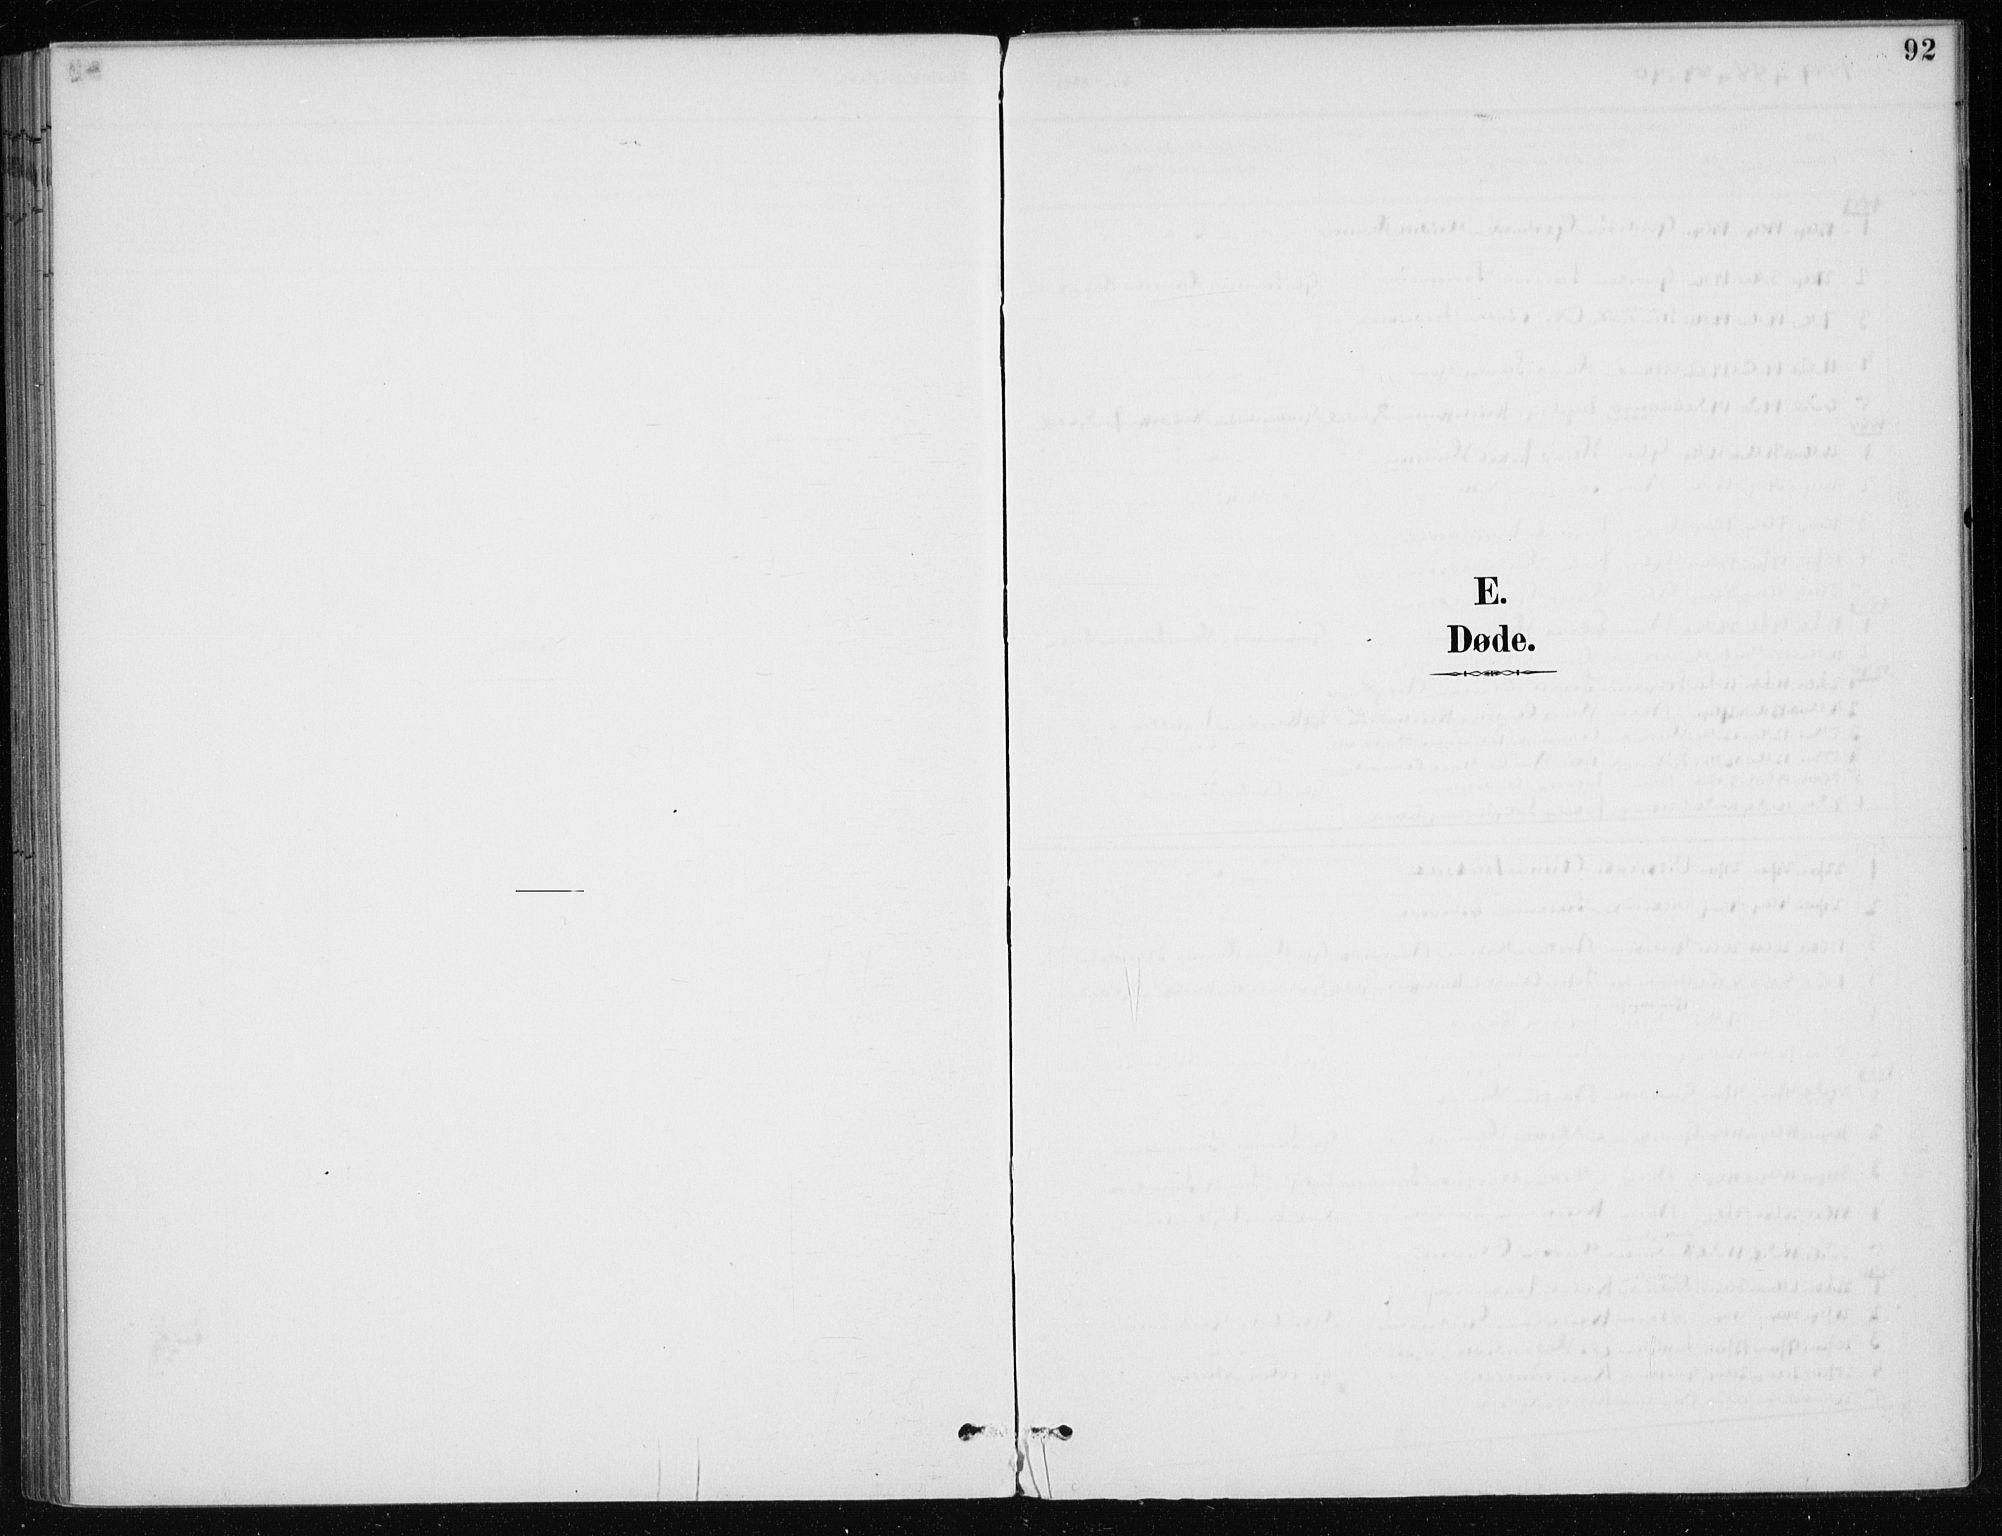 SAB, Kvinnherad Sokneprestembete, H/Haa: Ministerialbok nr. E 1, 1887-1912, s. 92